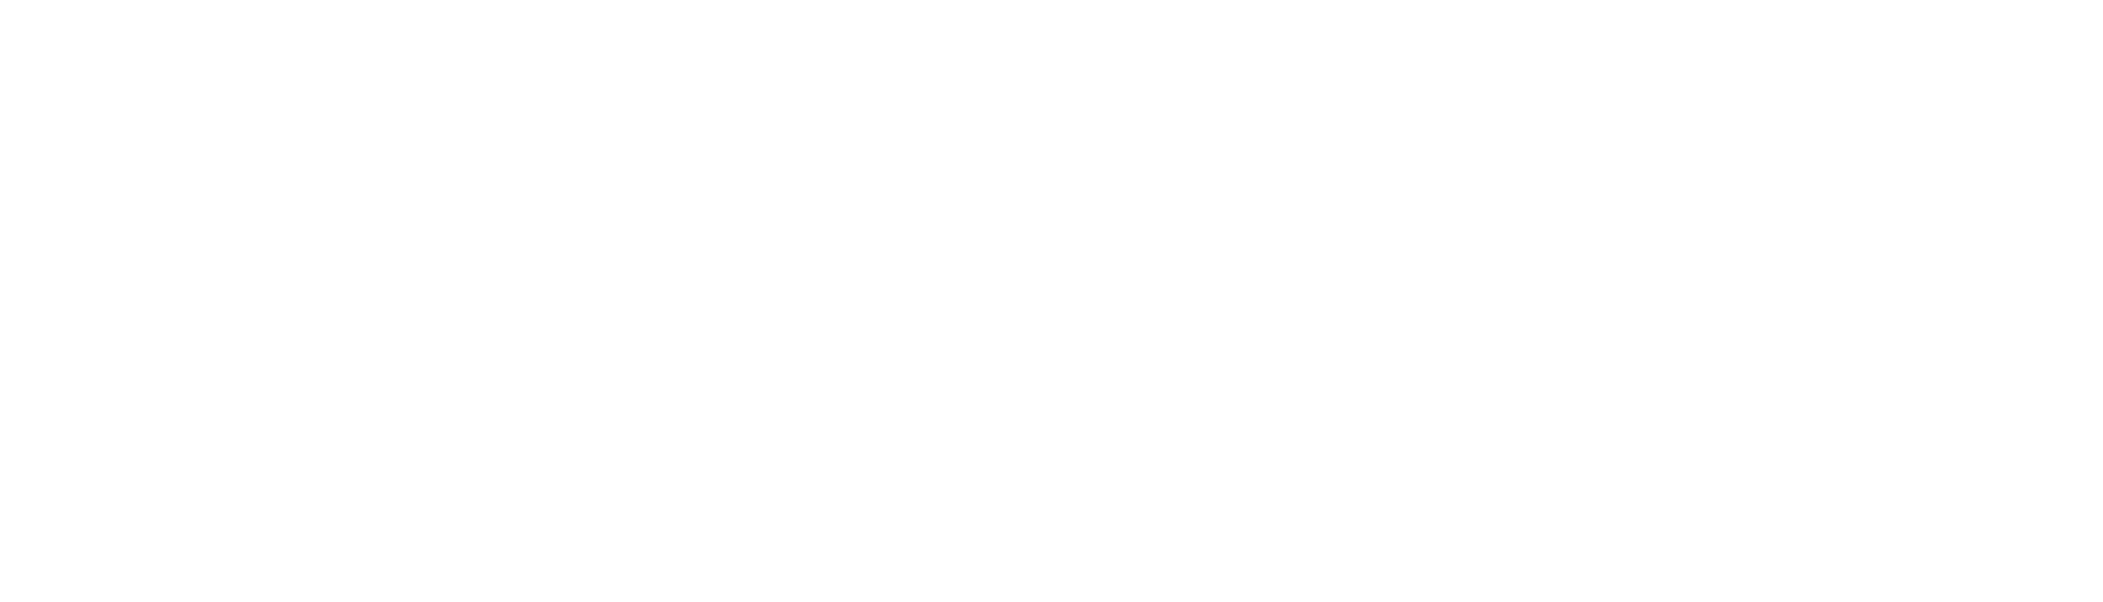 Pacsun Black Friday Sale 2017 - Pacsun, Transparent background PNG HD thumbnail